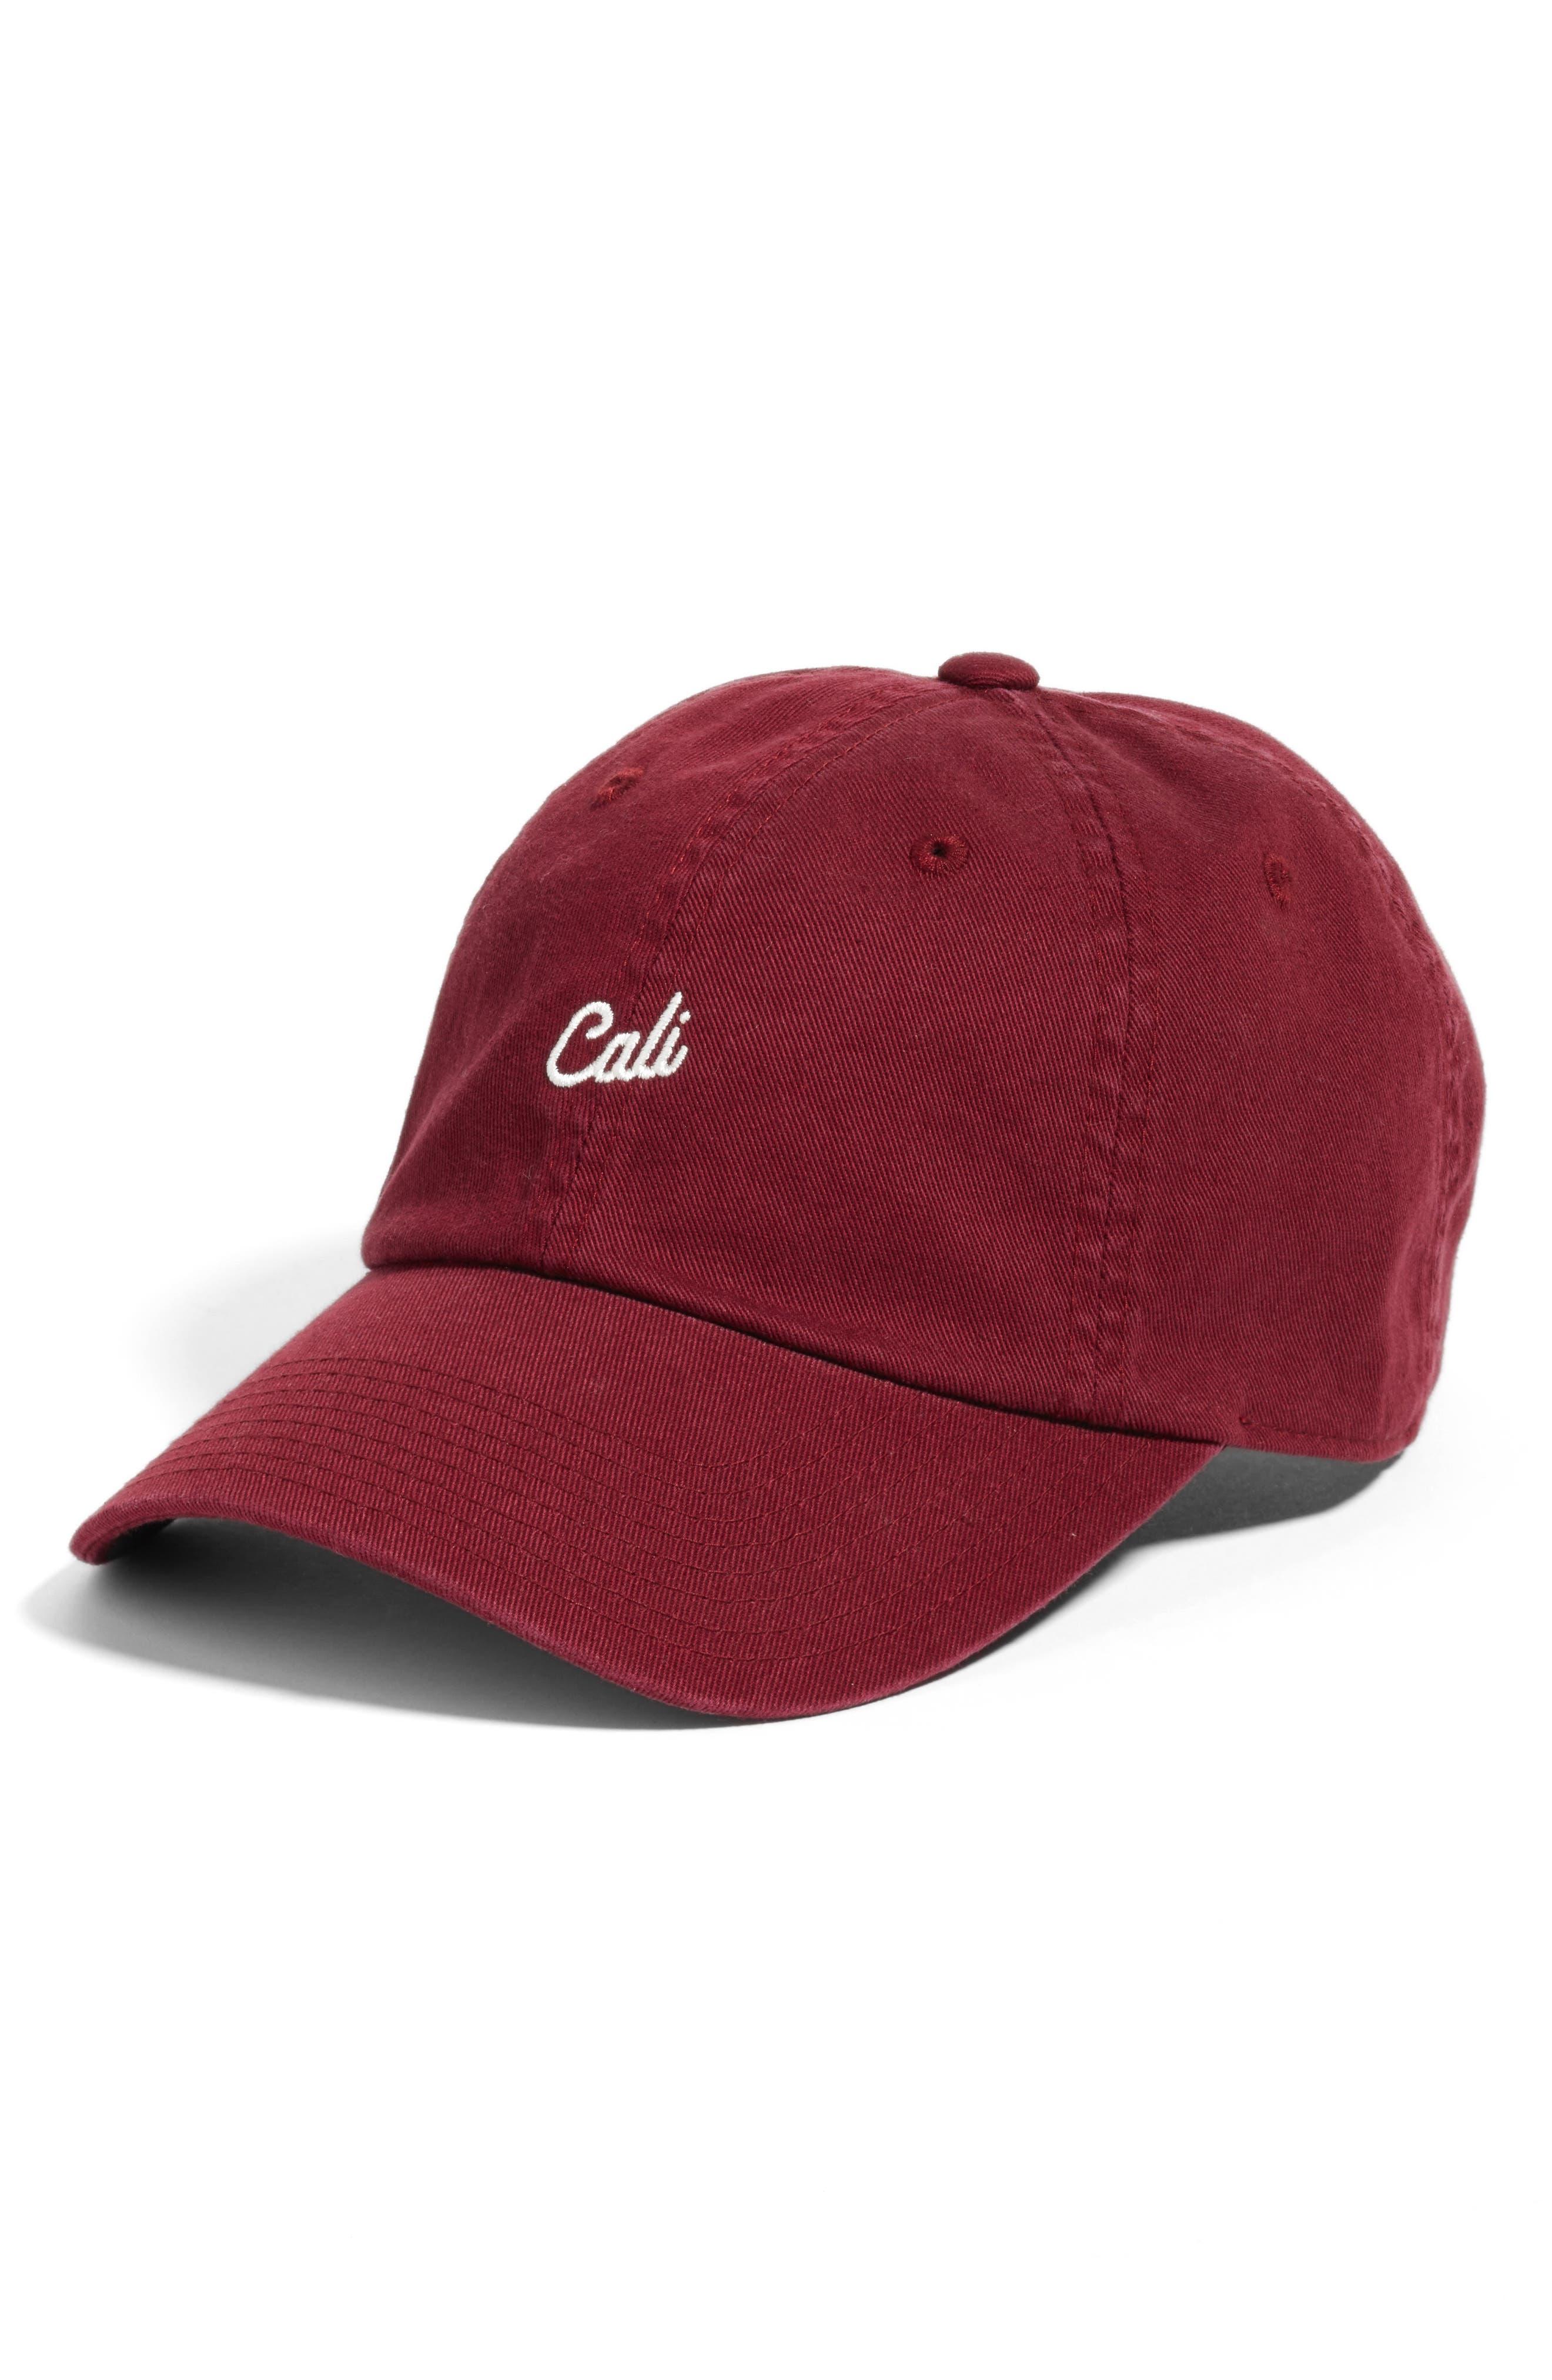 American Needle Boardshort - Cali Baseball Cap